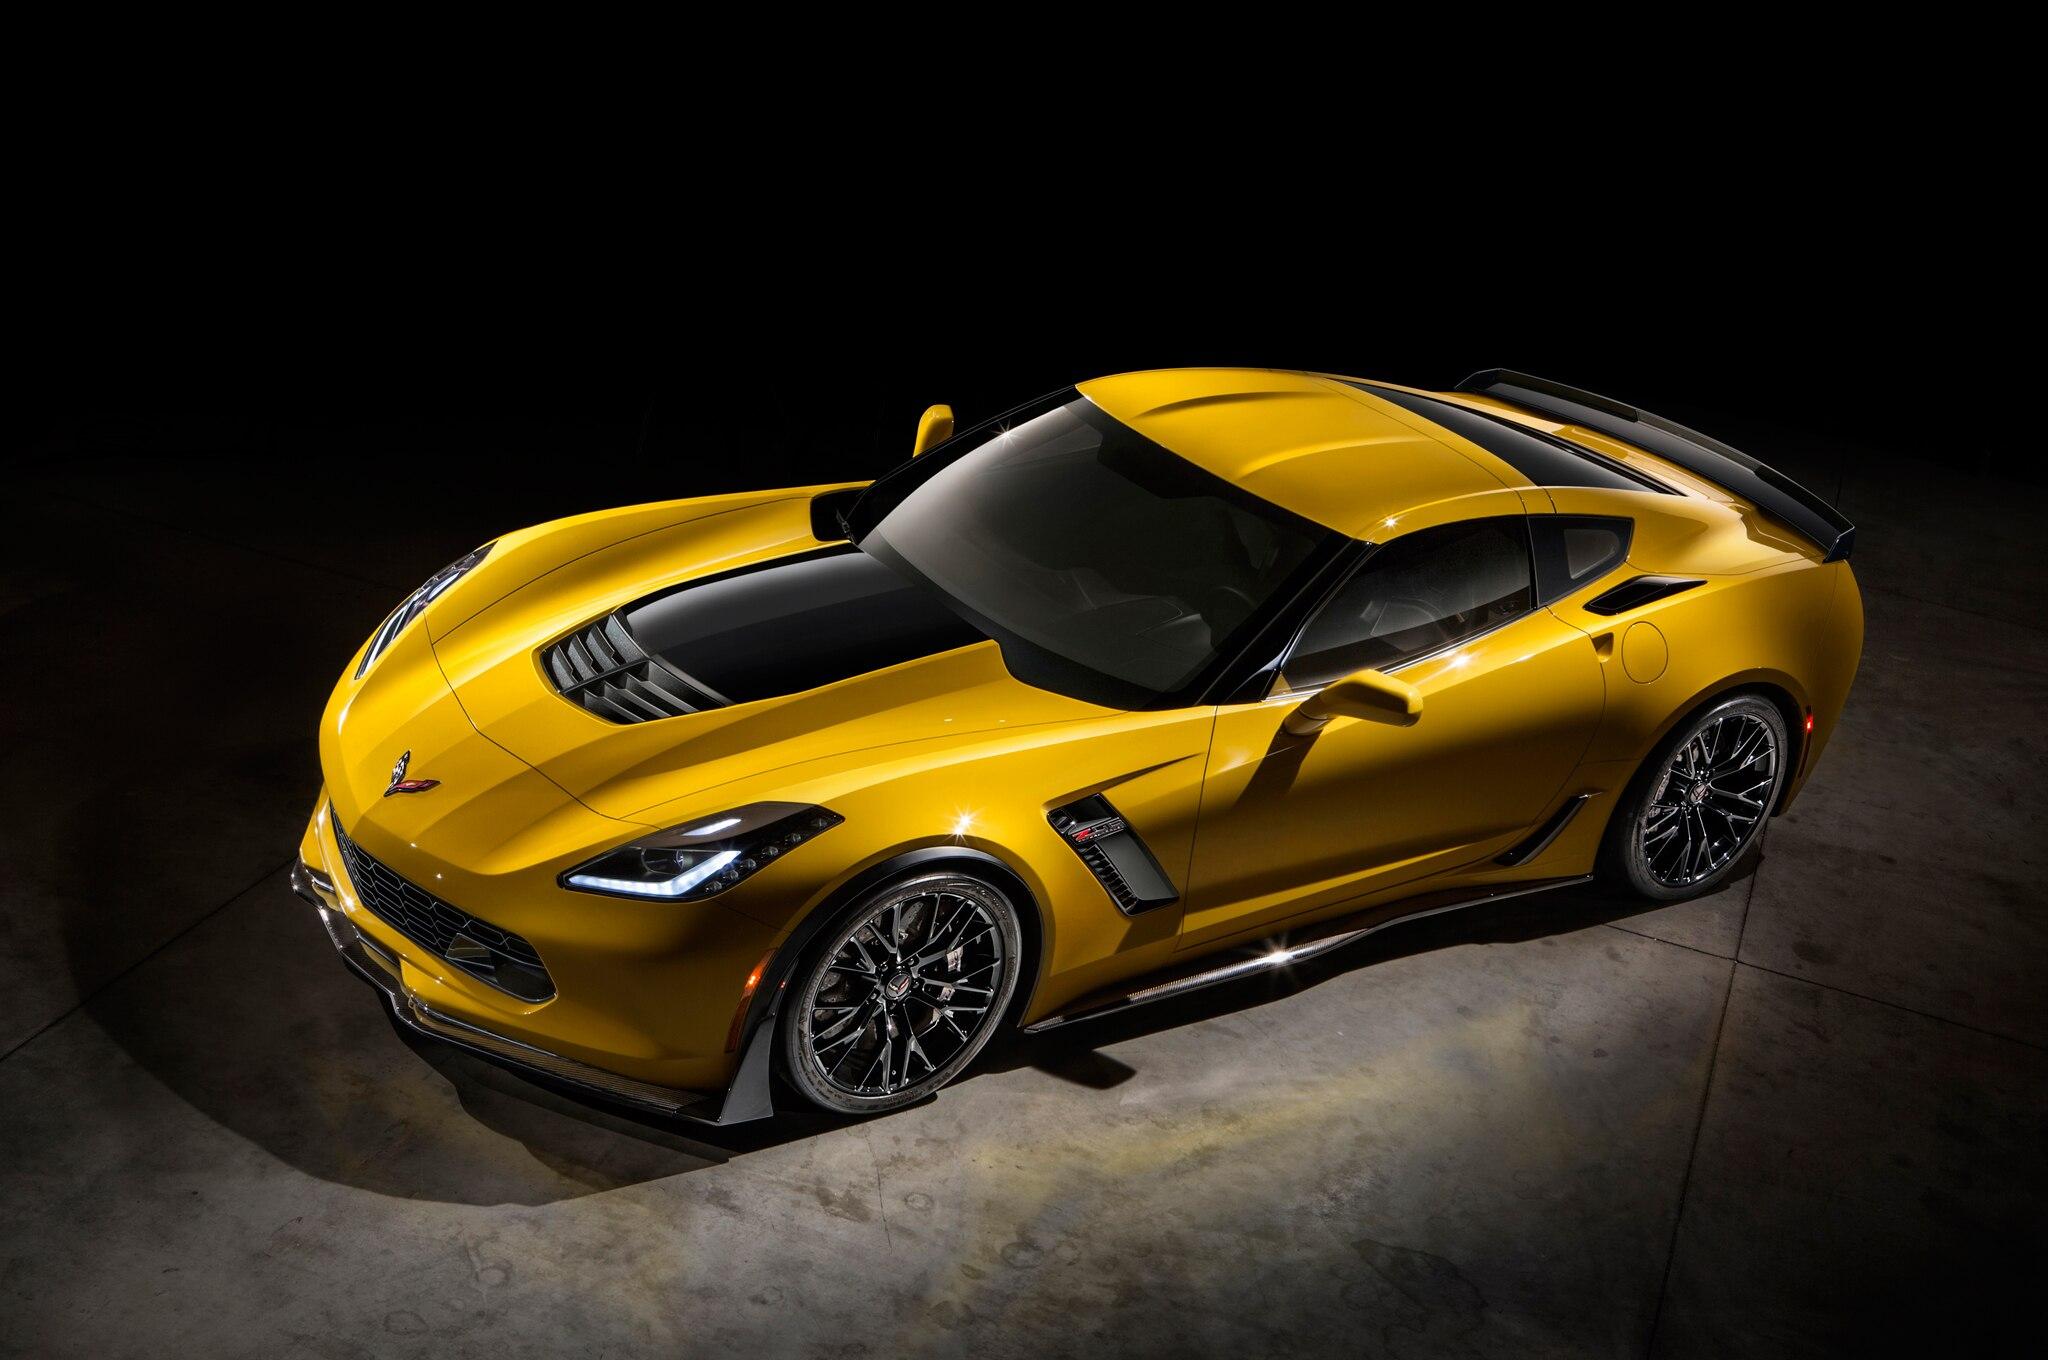 2015 corvette z06. the 2015 corvette z06